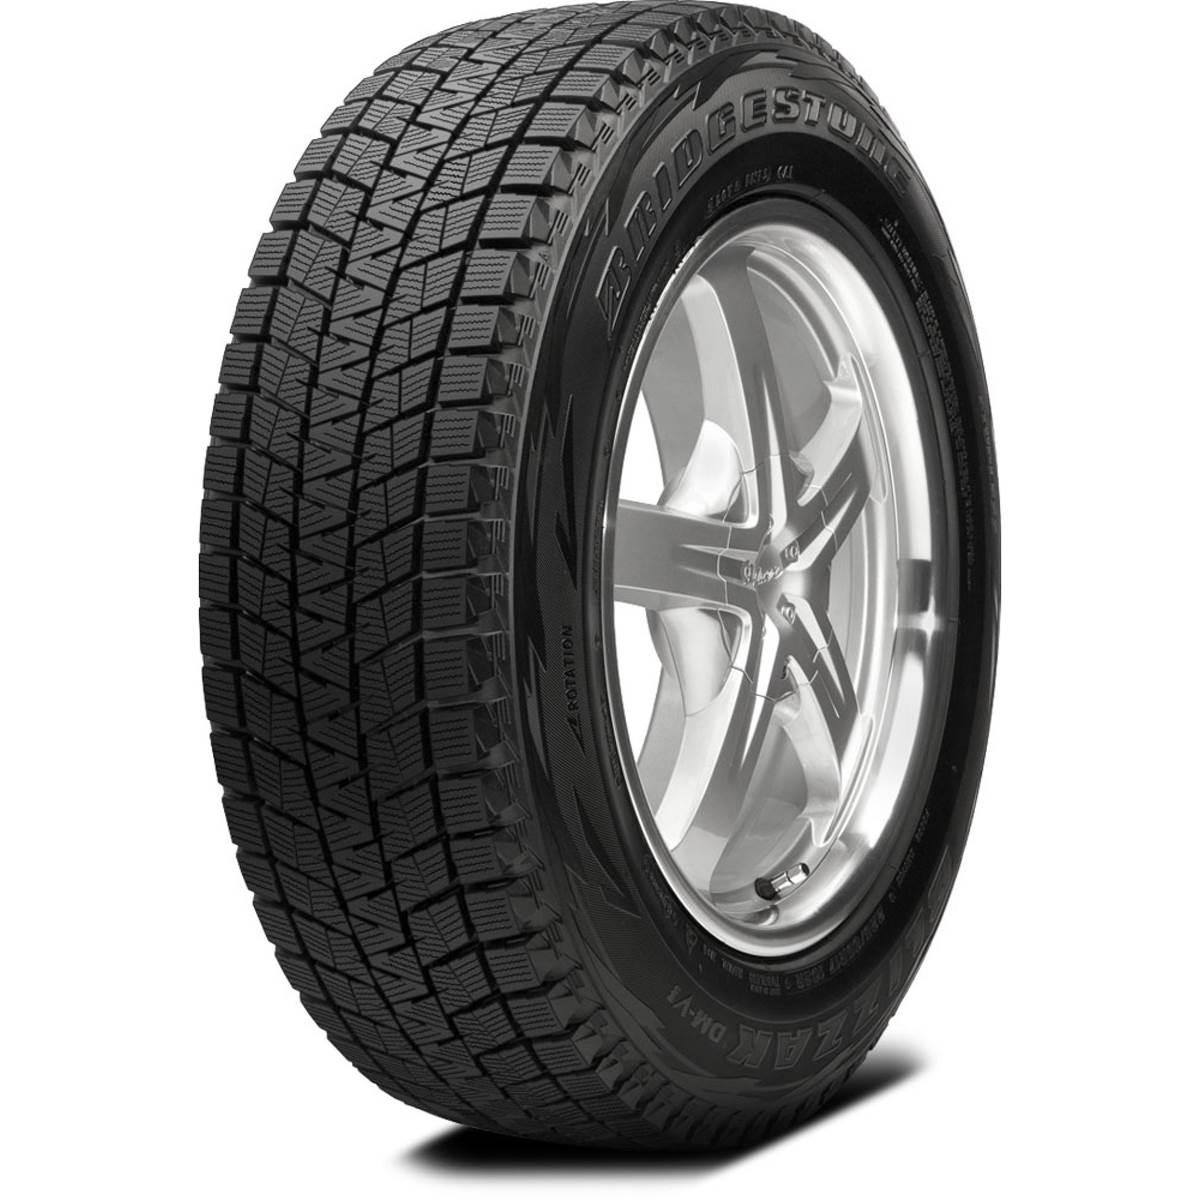 Pneu Bridgestone 195/80R15 96R